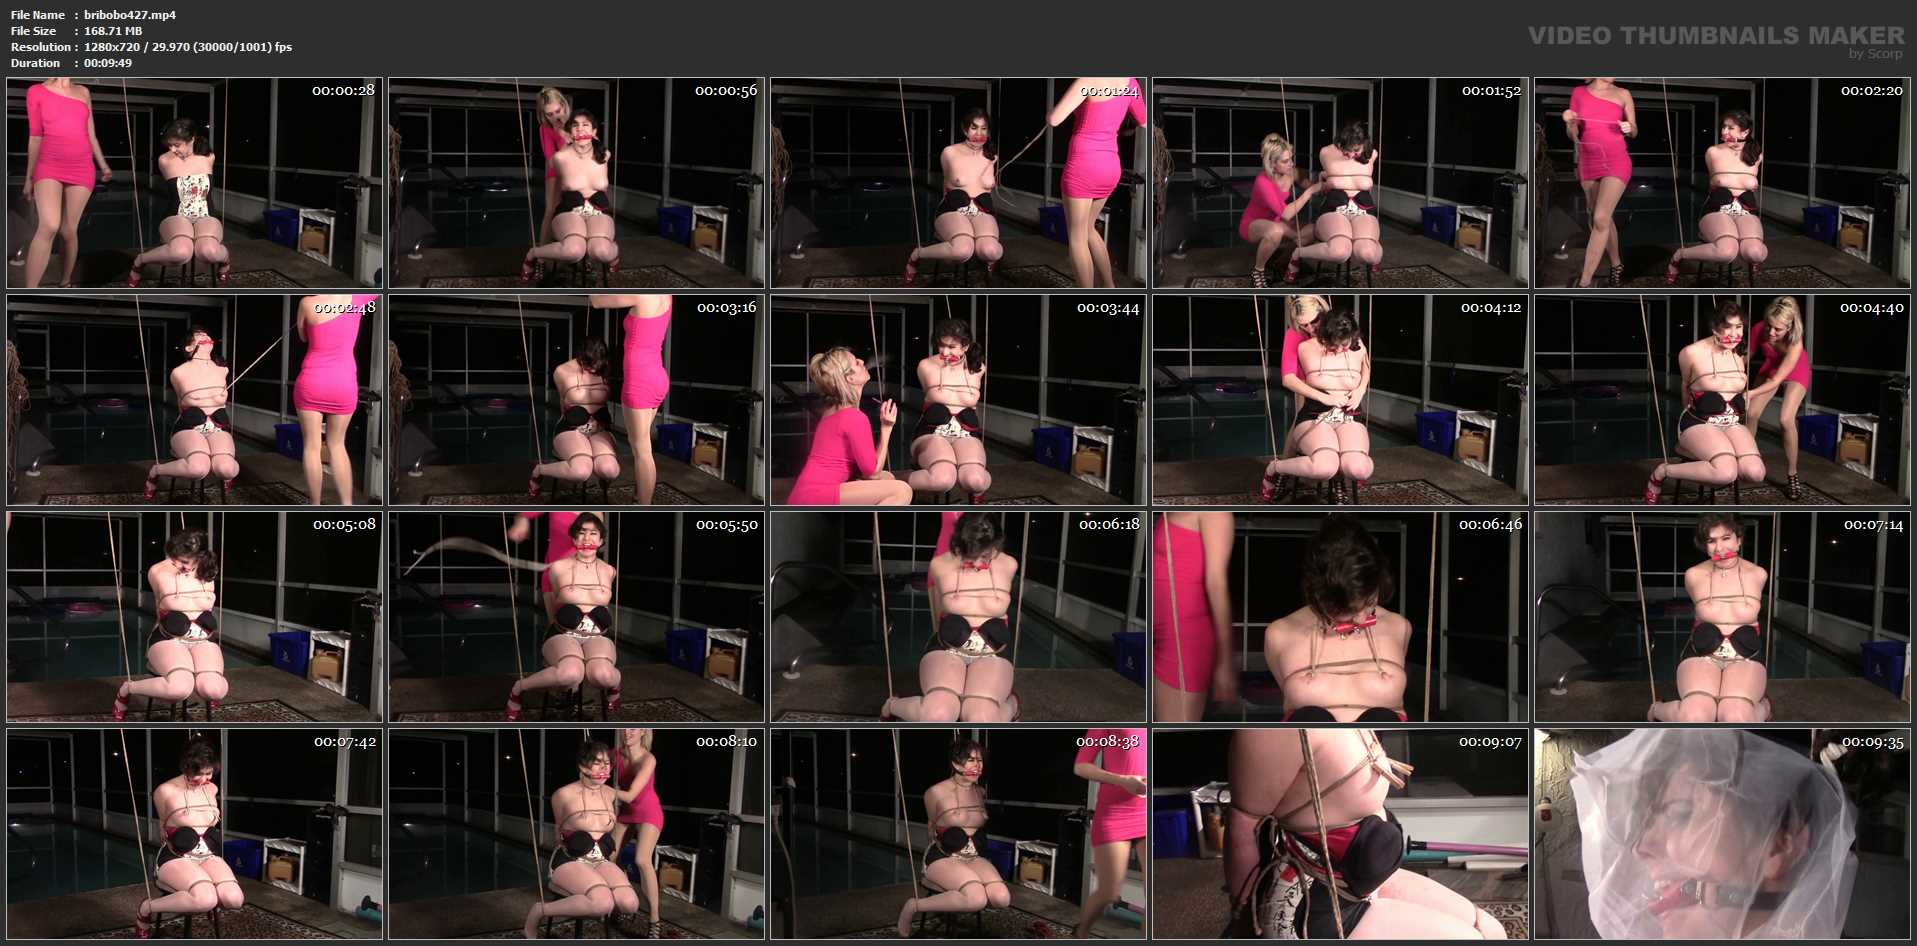 Briella Jaden In Scene: Struggle Struggle Struggle You Drooling Little Bitch - BRIELLASBONDAGEBOUTIQUE - HD/720p/MP4